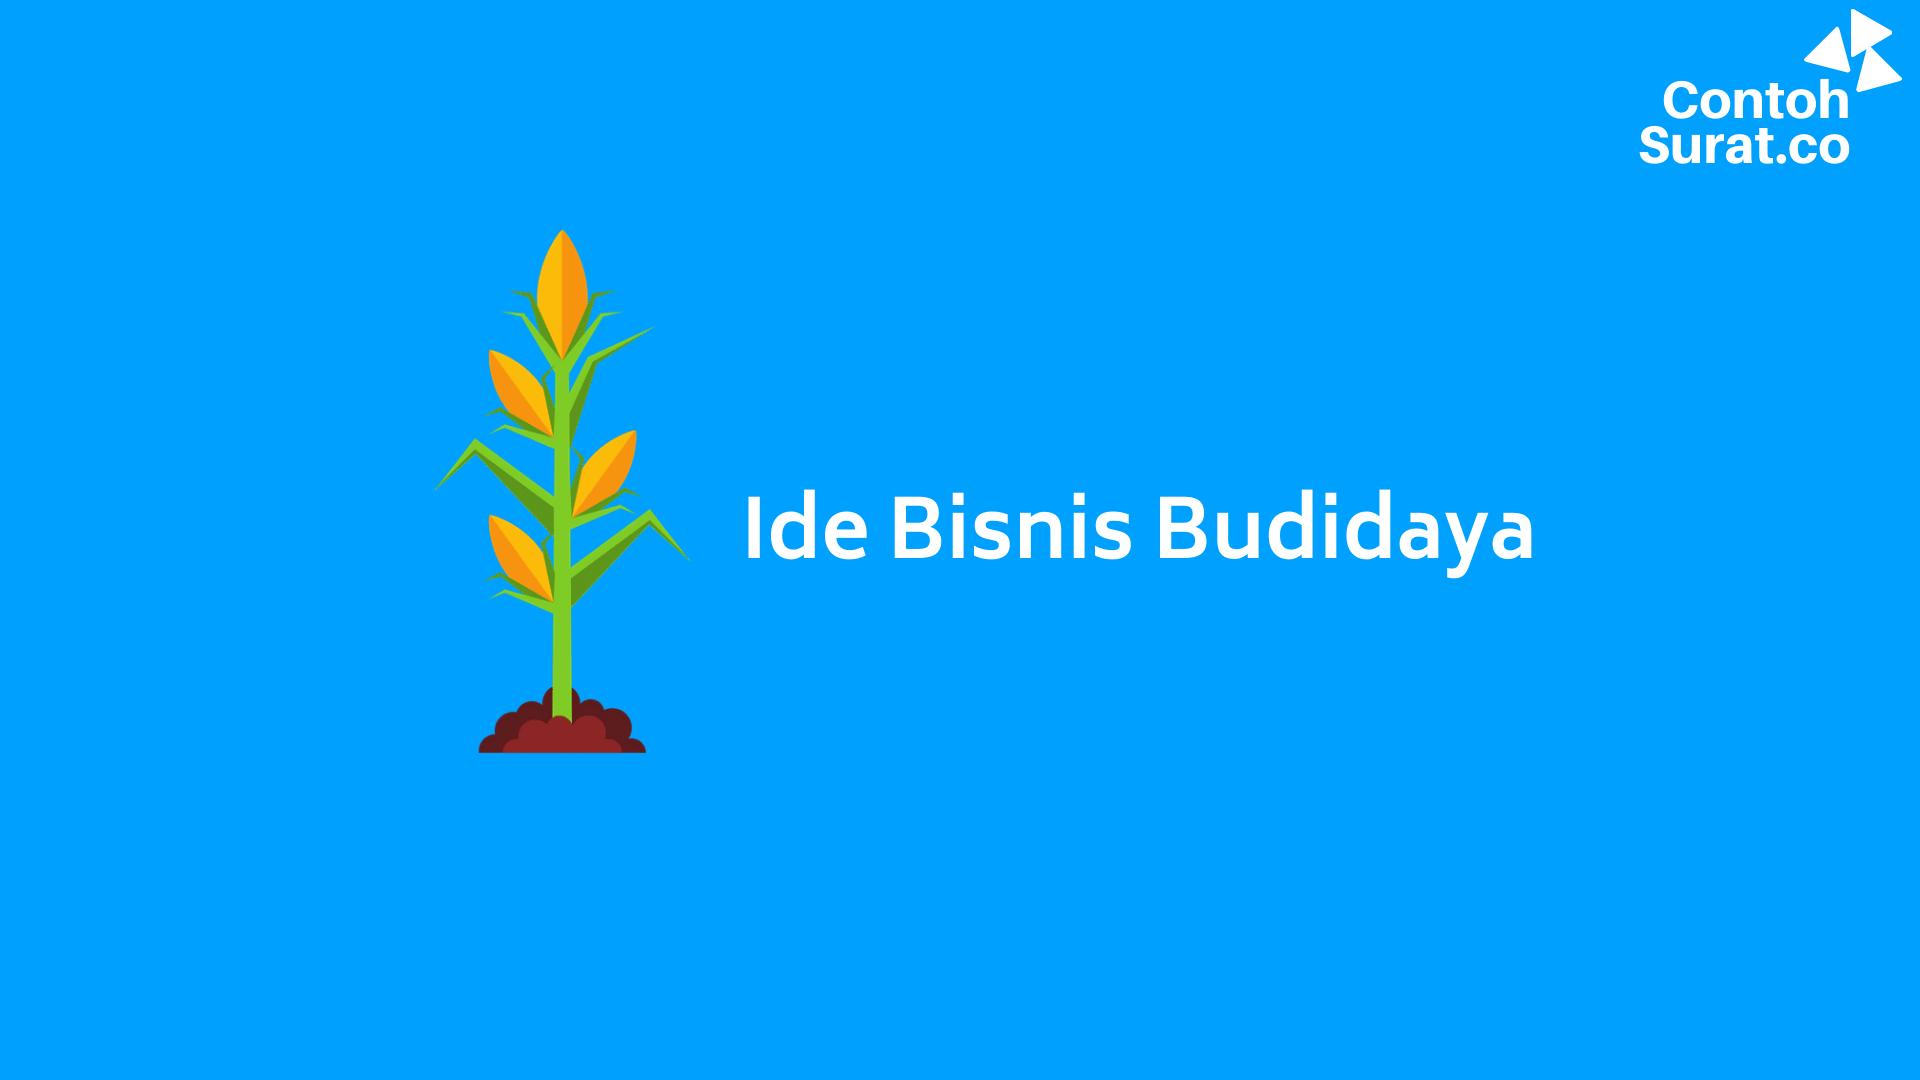 Ide Bisnis Budidaya